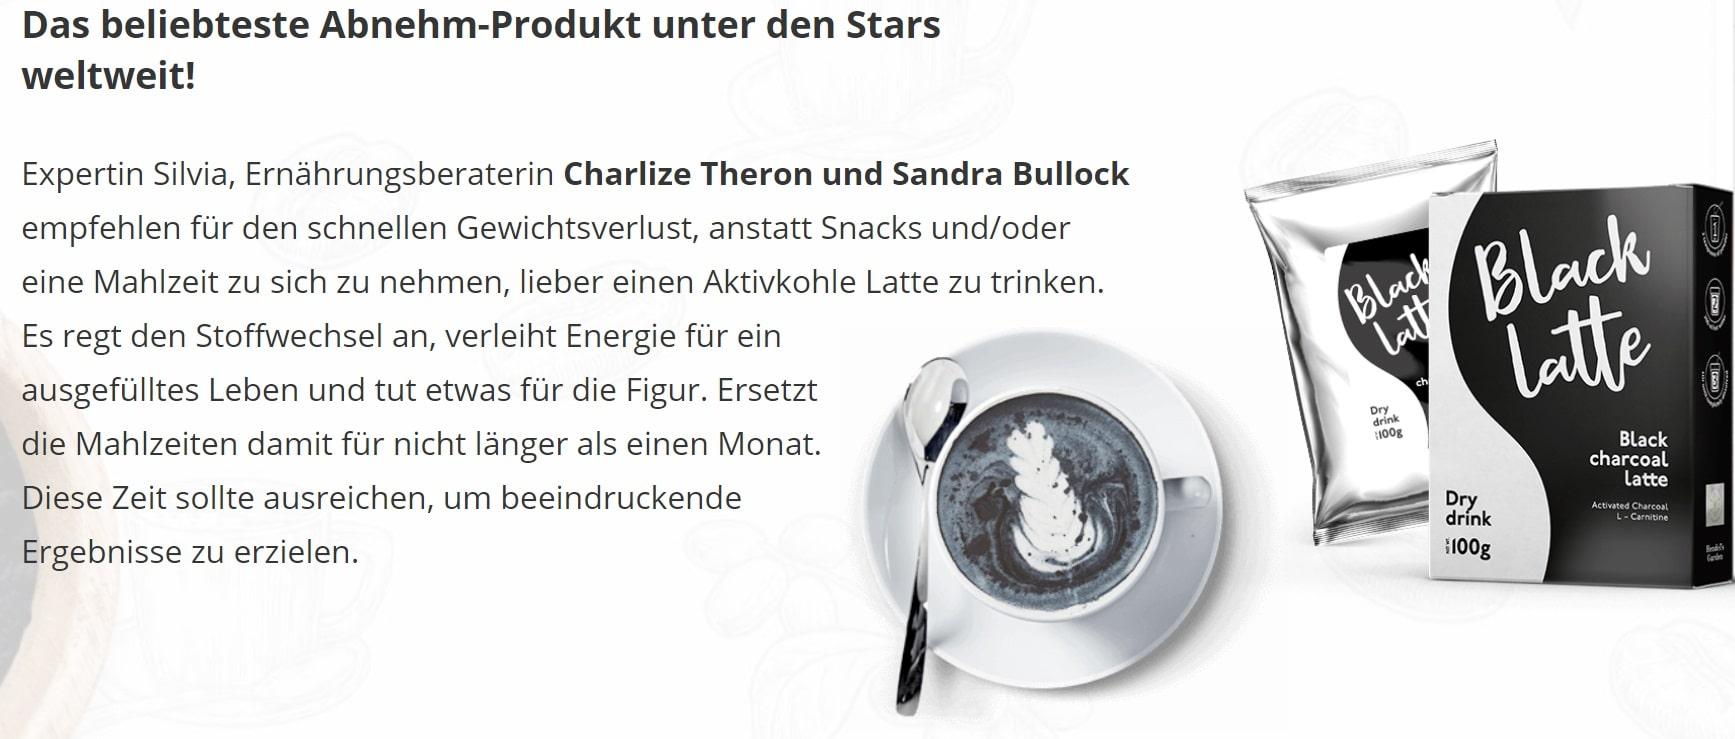 Black-Latte-Starseite2